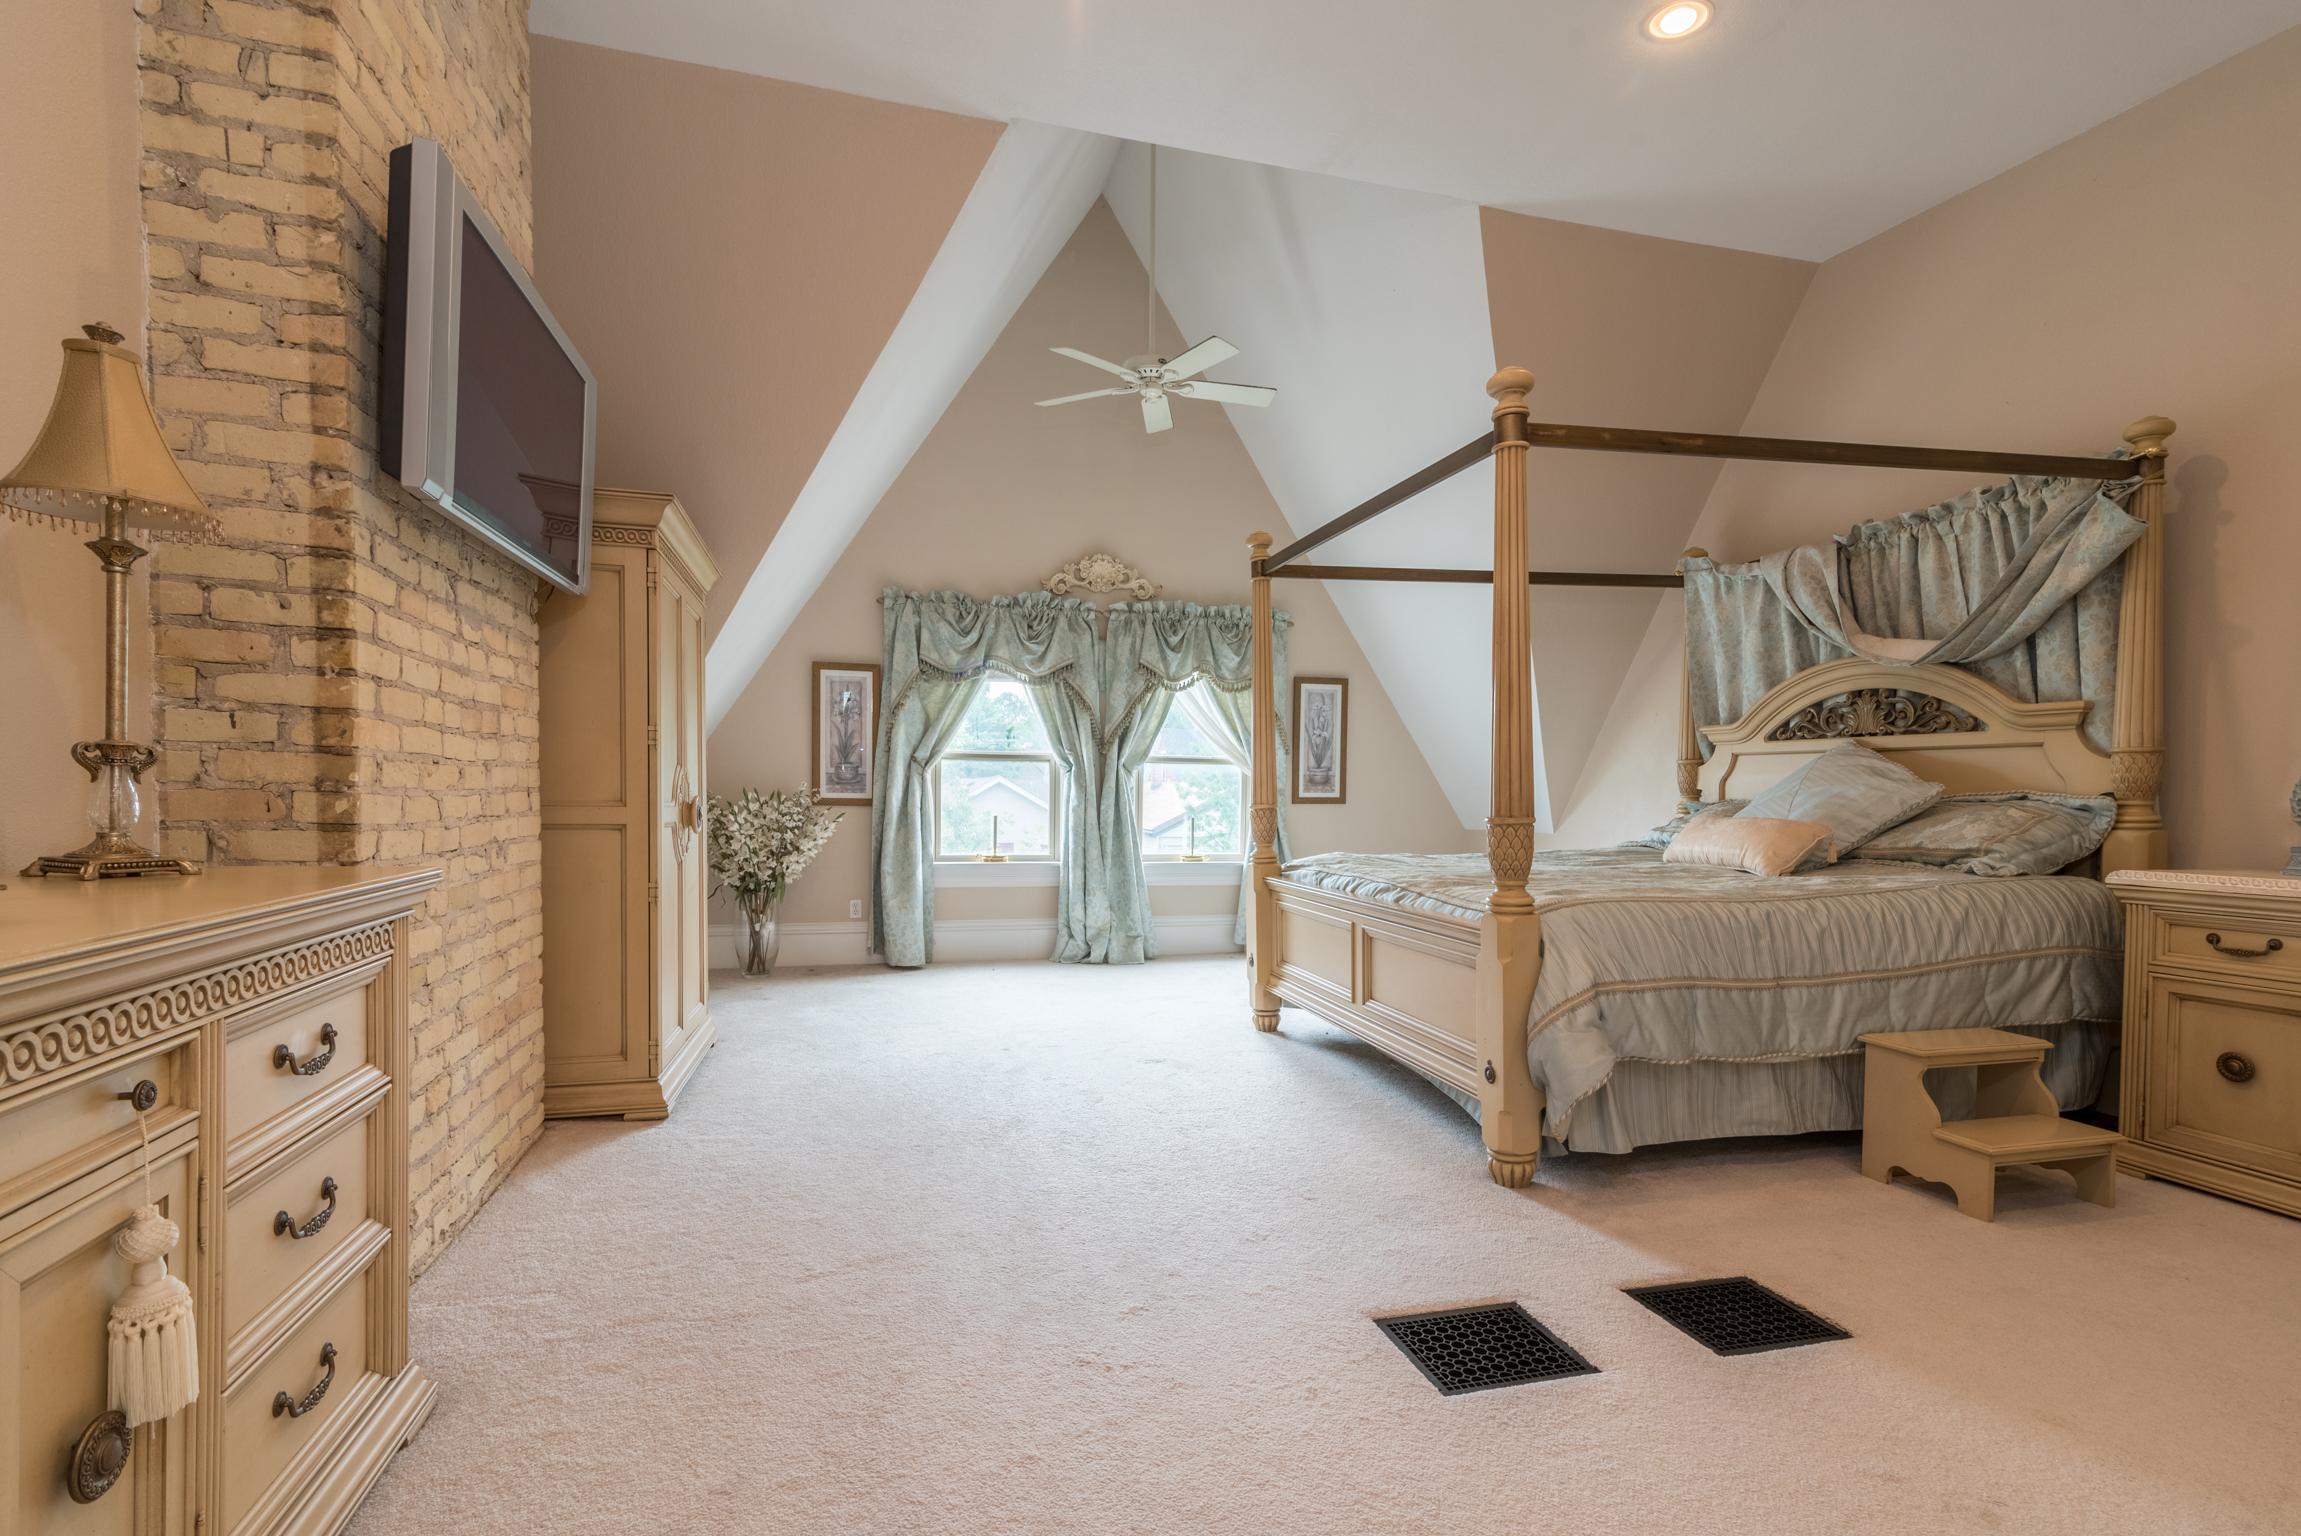 Photography of bedroom by James Meyer Photography jamesmeyerphoto.com Milwaukee Wisconsin